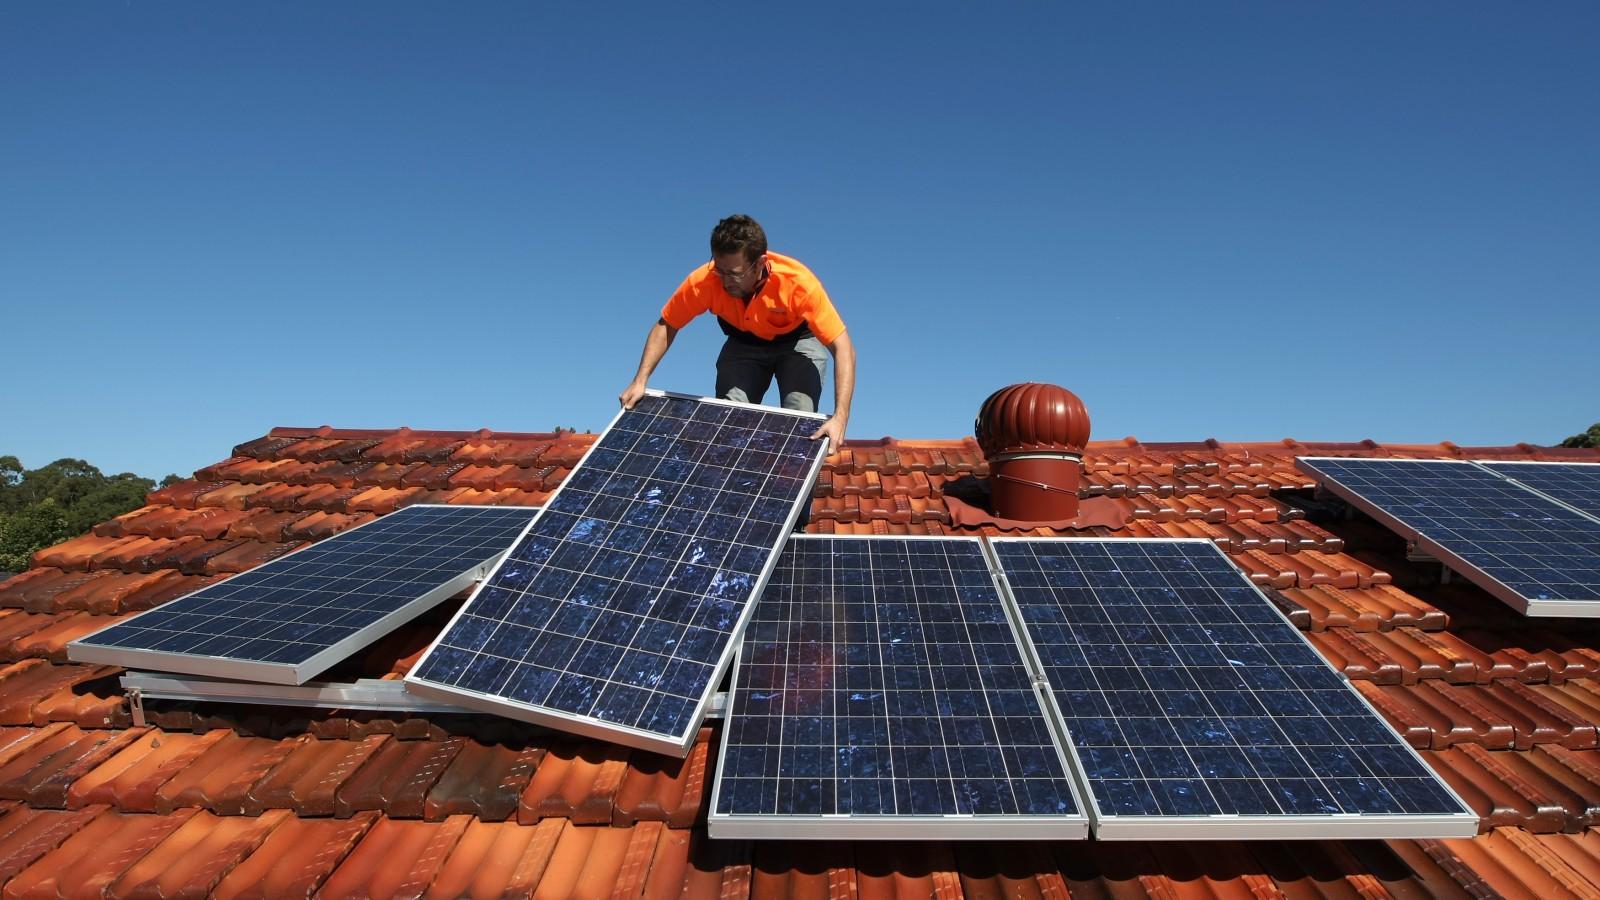 Solar system installer Thomas Bywater adjusts new solar panels.